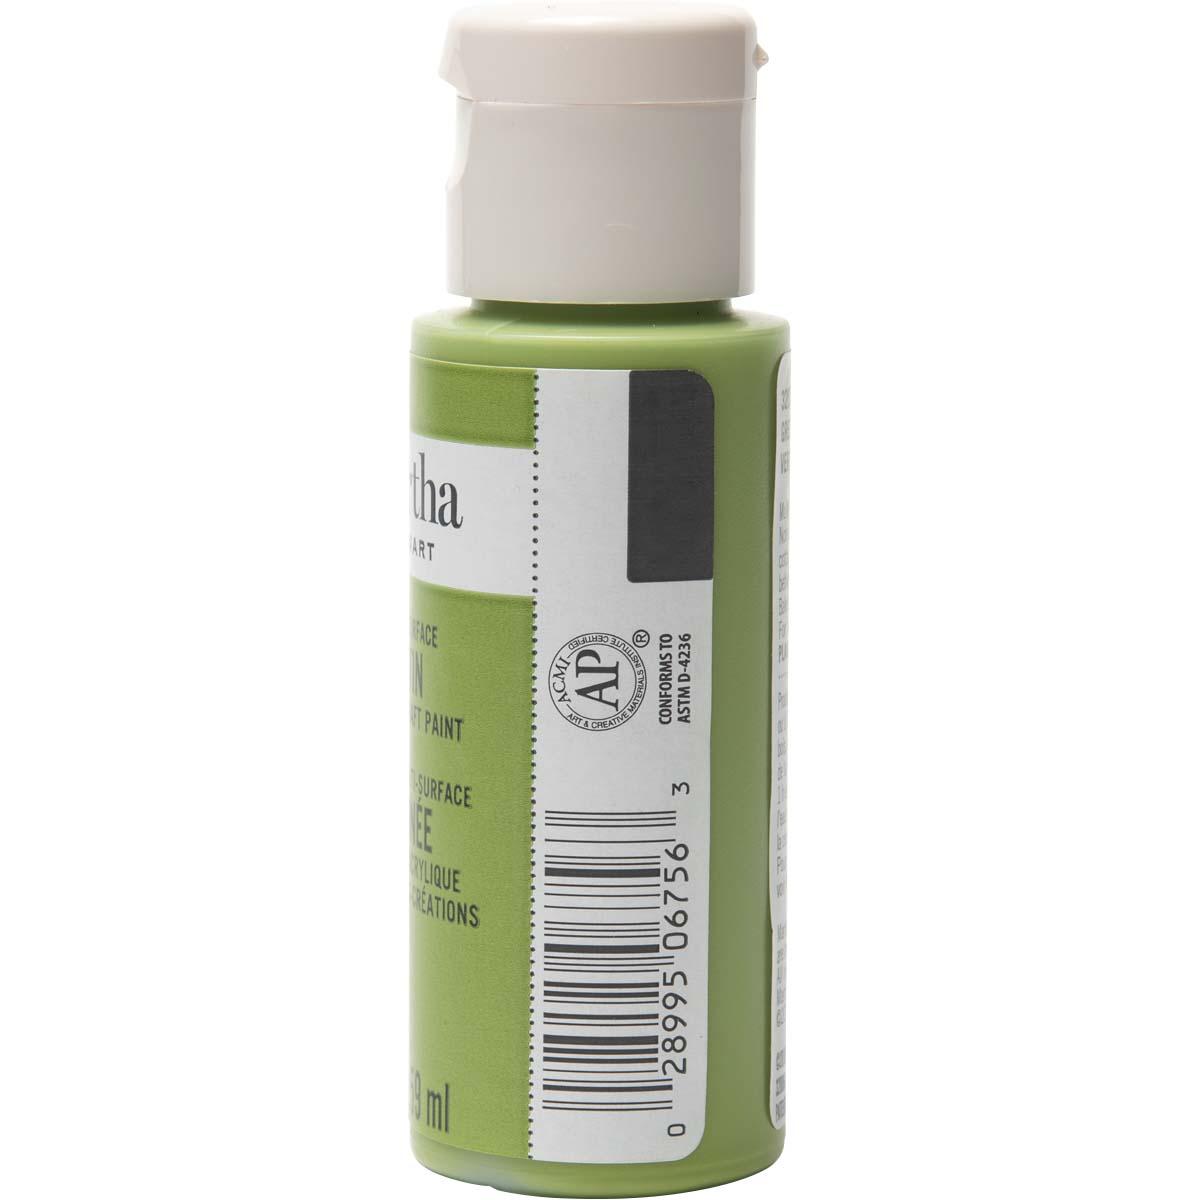 Martha Stewart® 2oz Multi-Surface Satin Acrylic Craft Paint - Green Olive